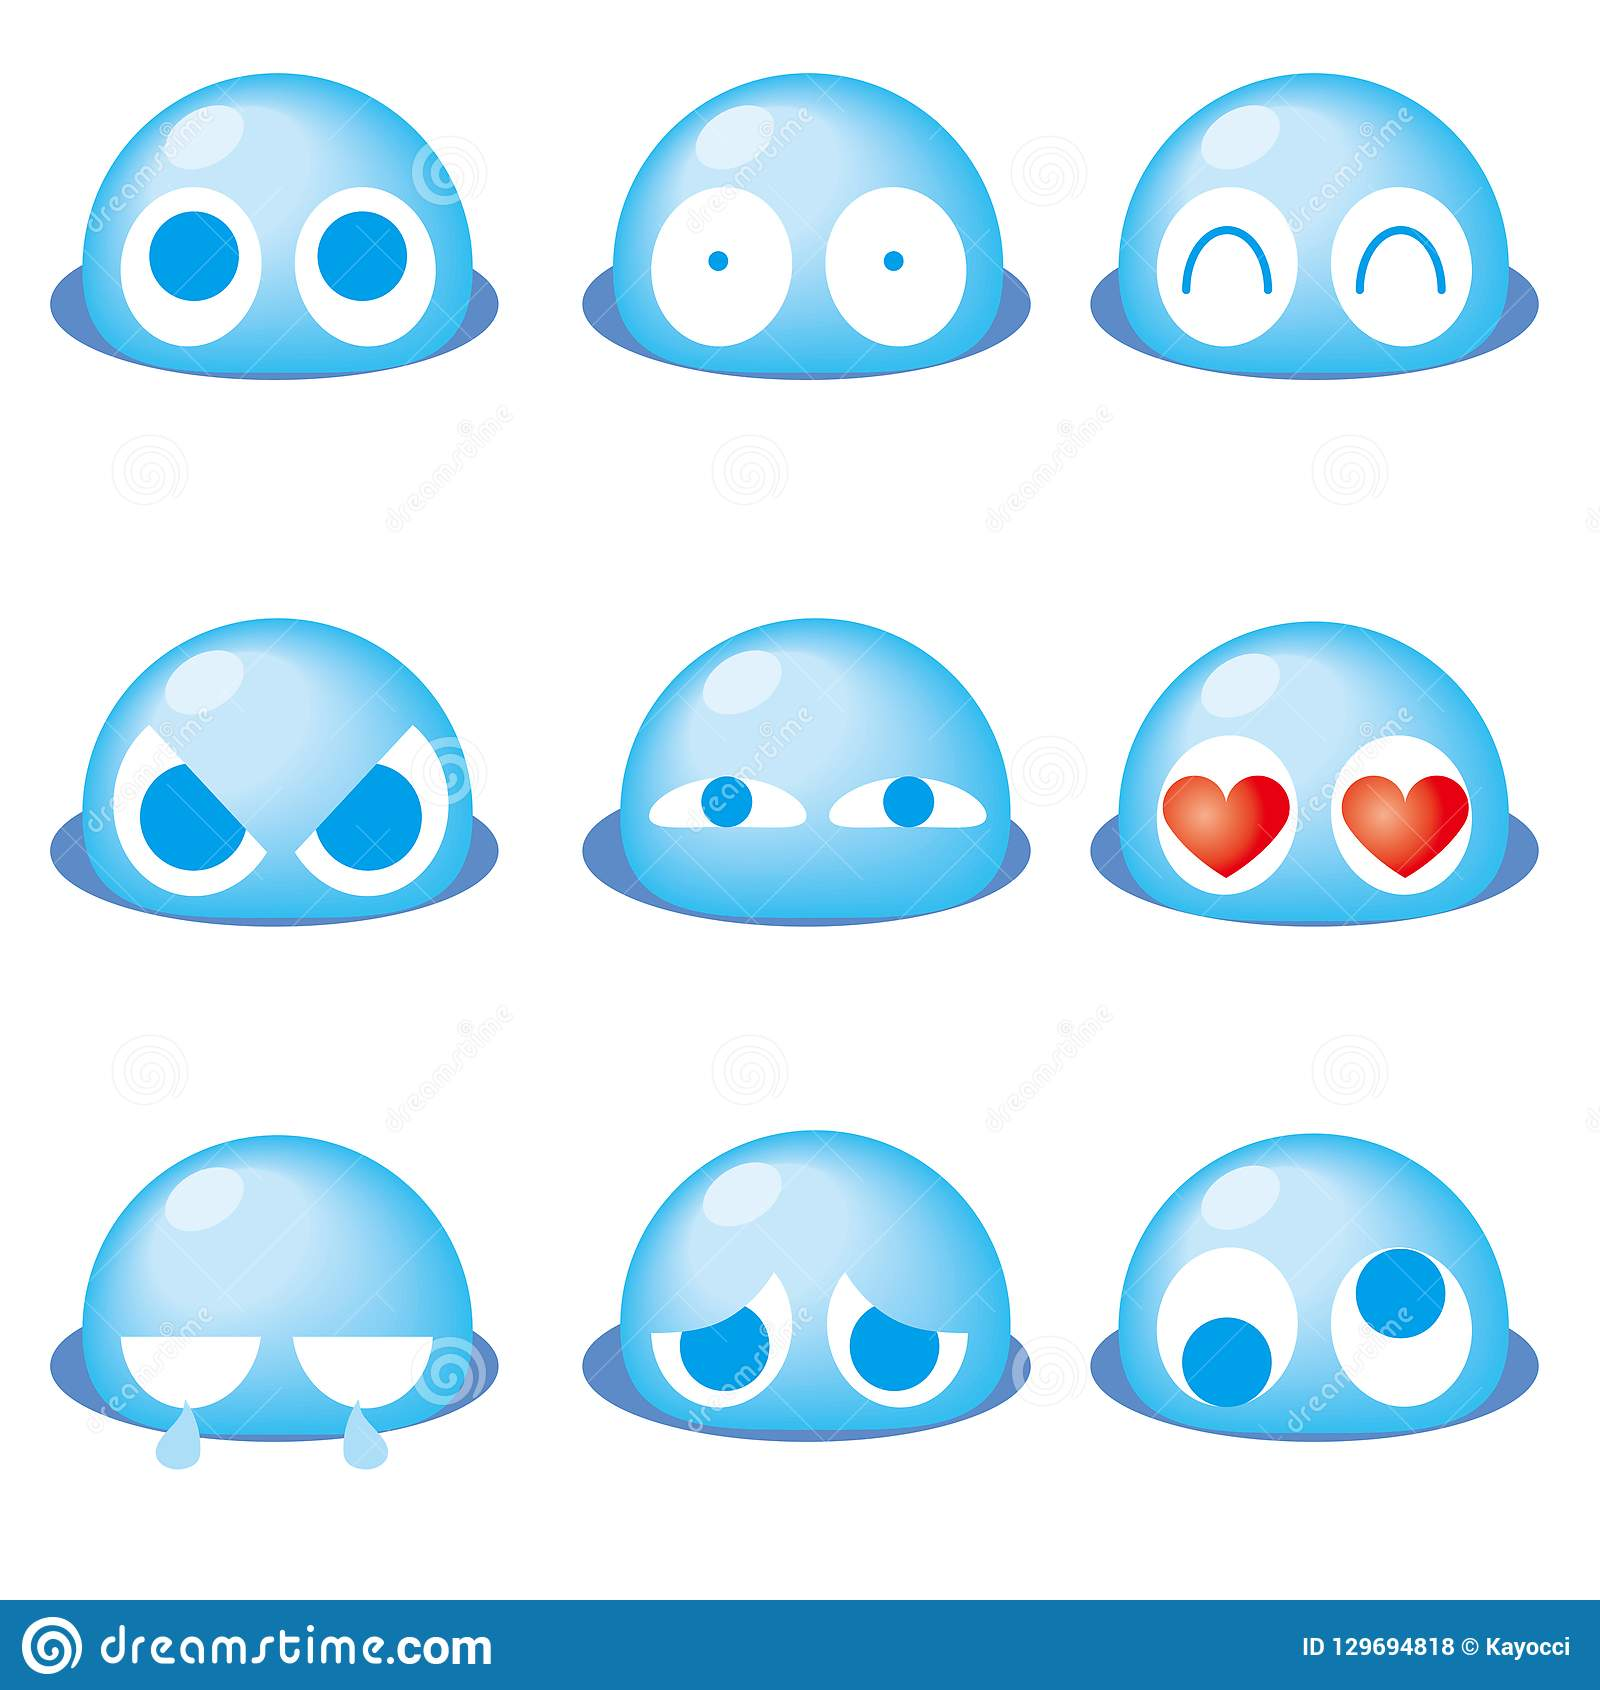 Blå gullig emoticon 9set -